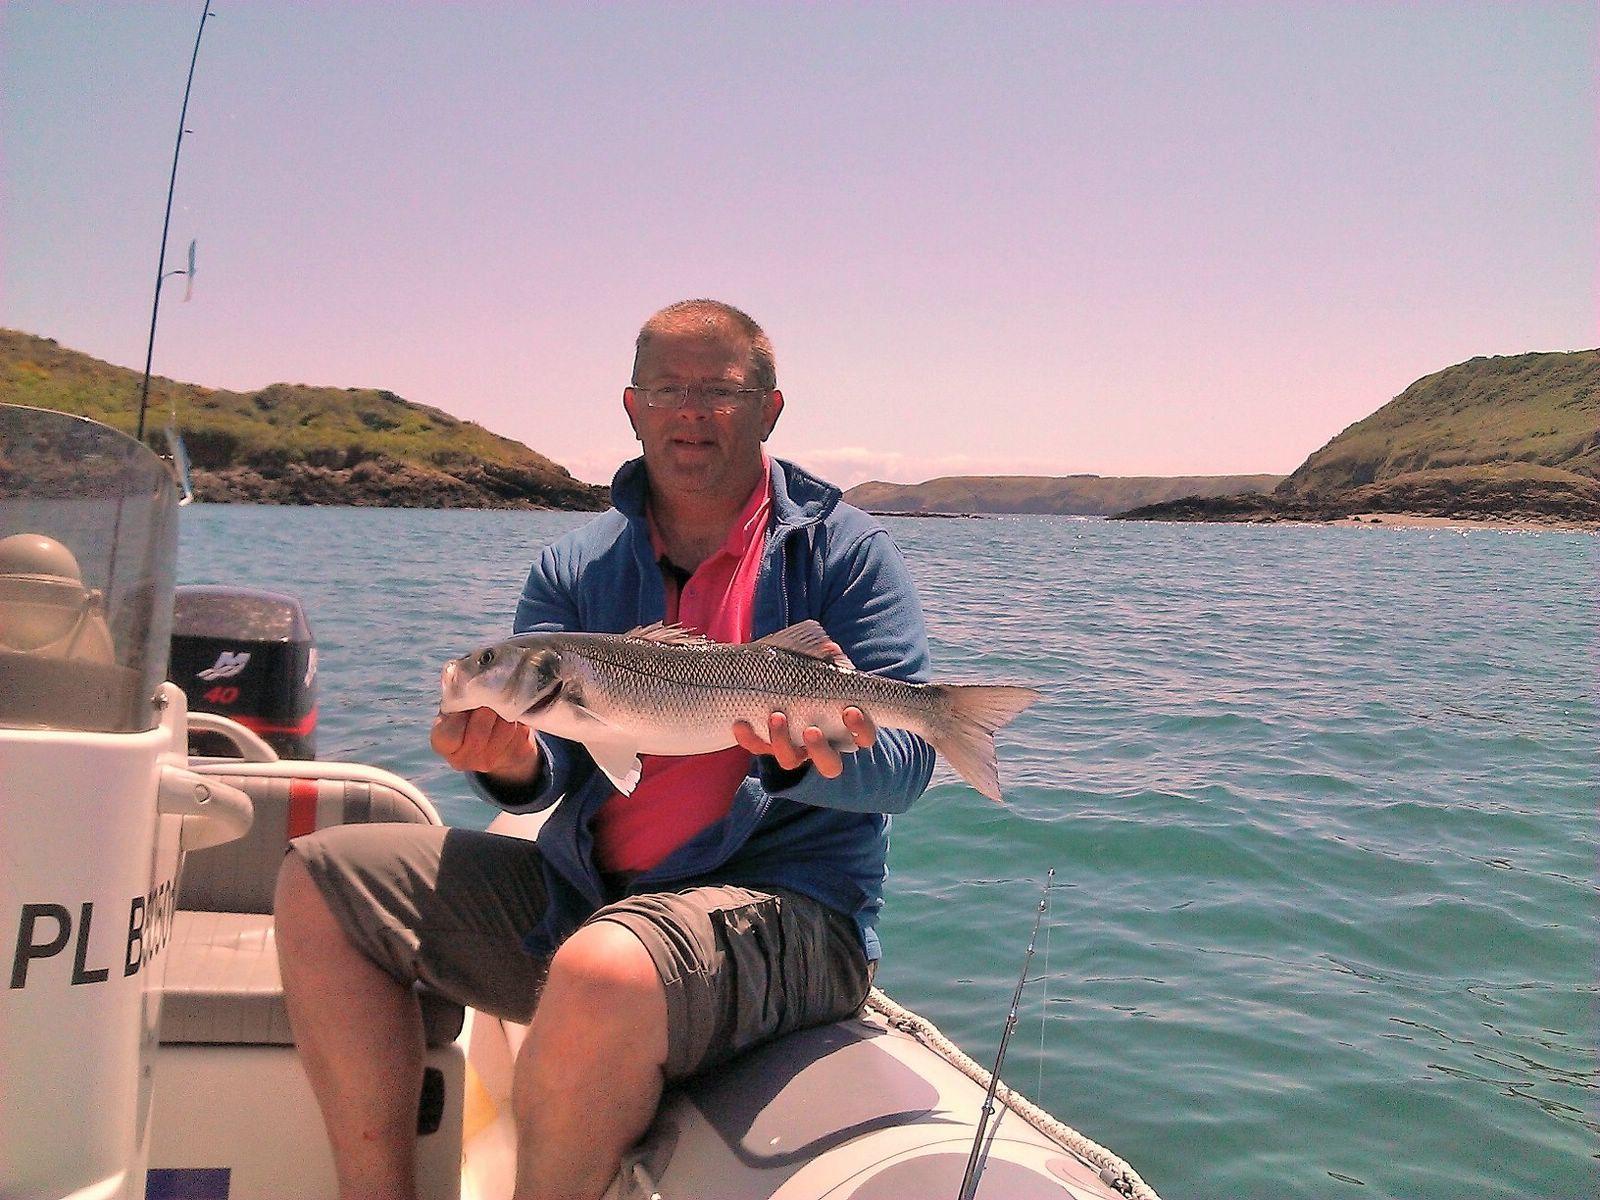 pêche en semi rigide, Bretagne, Valiant 450